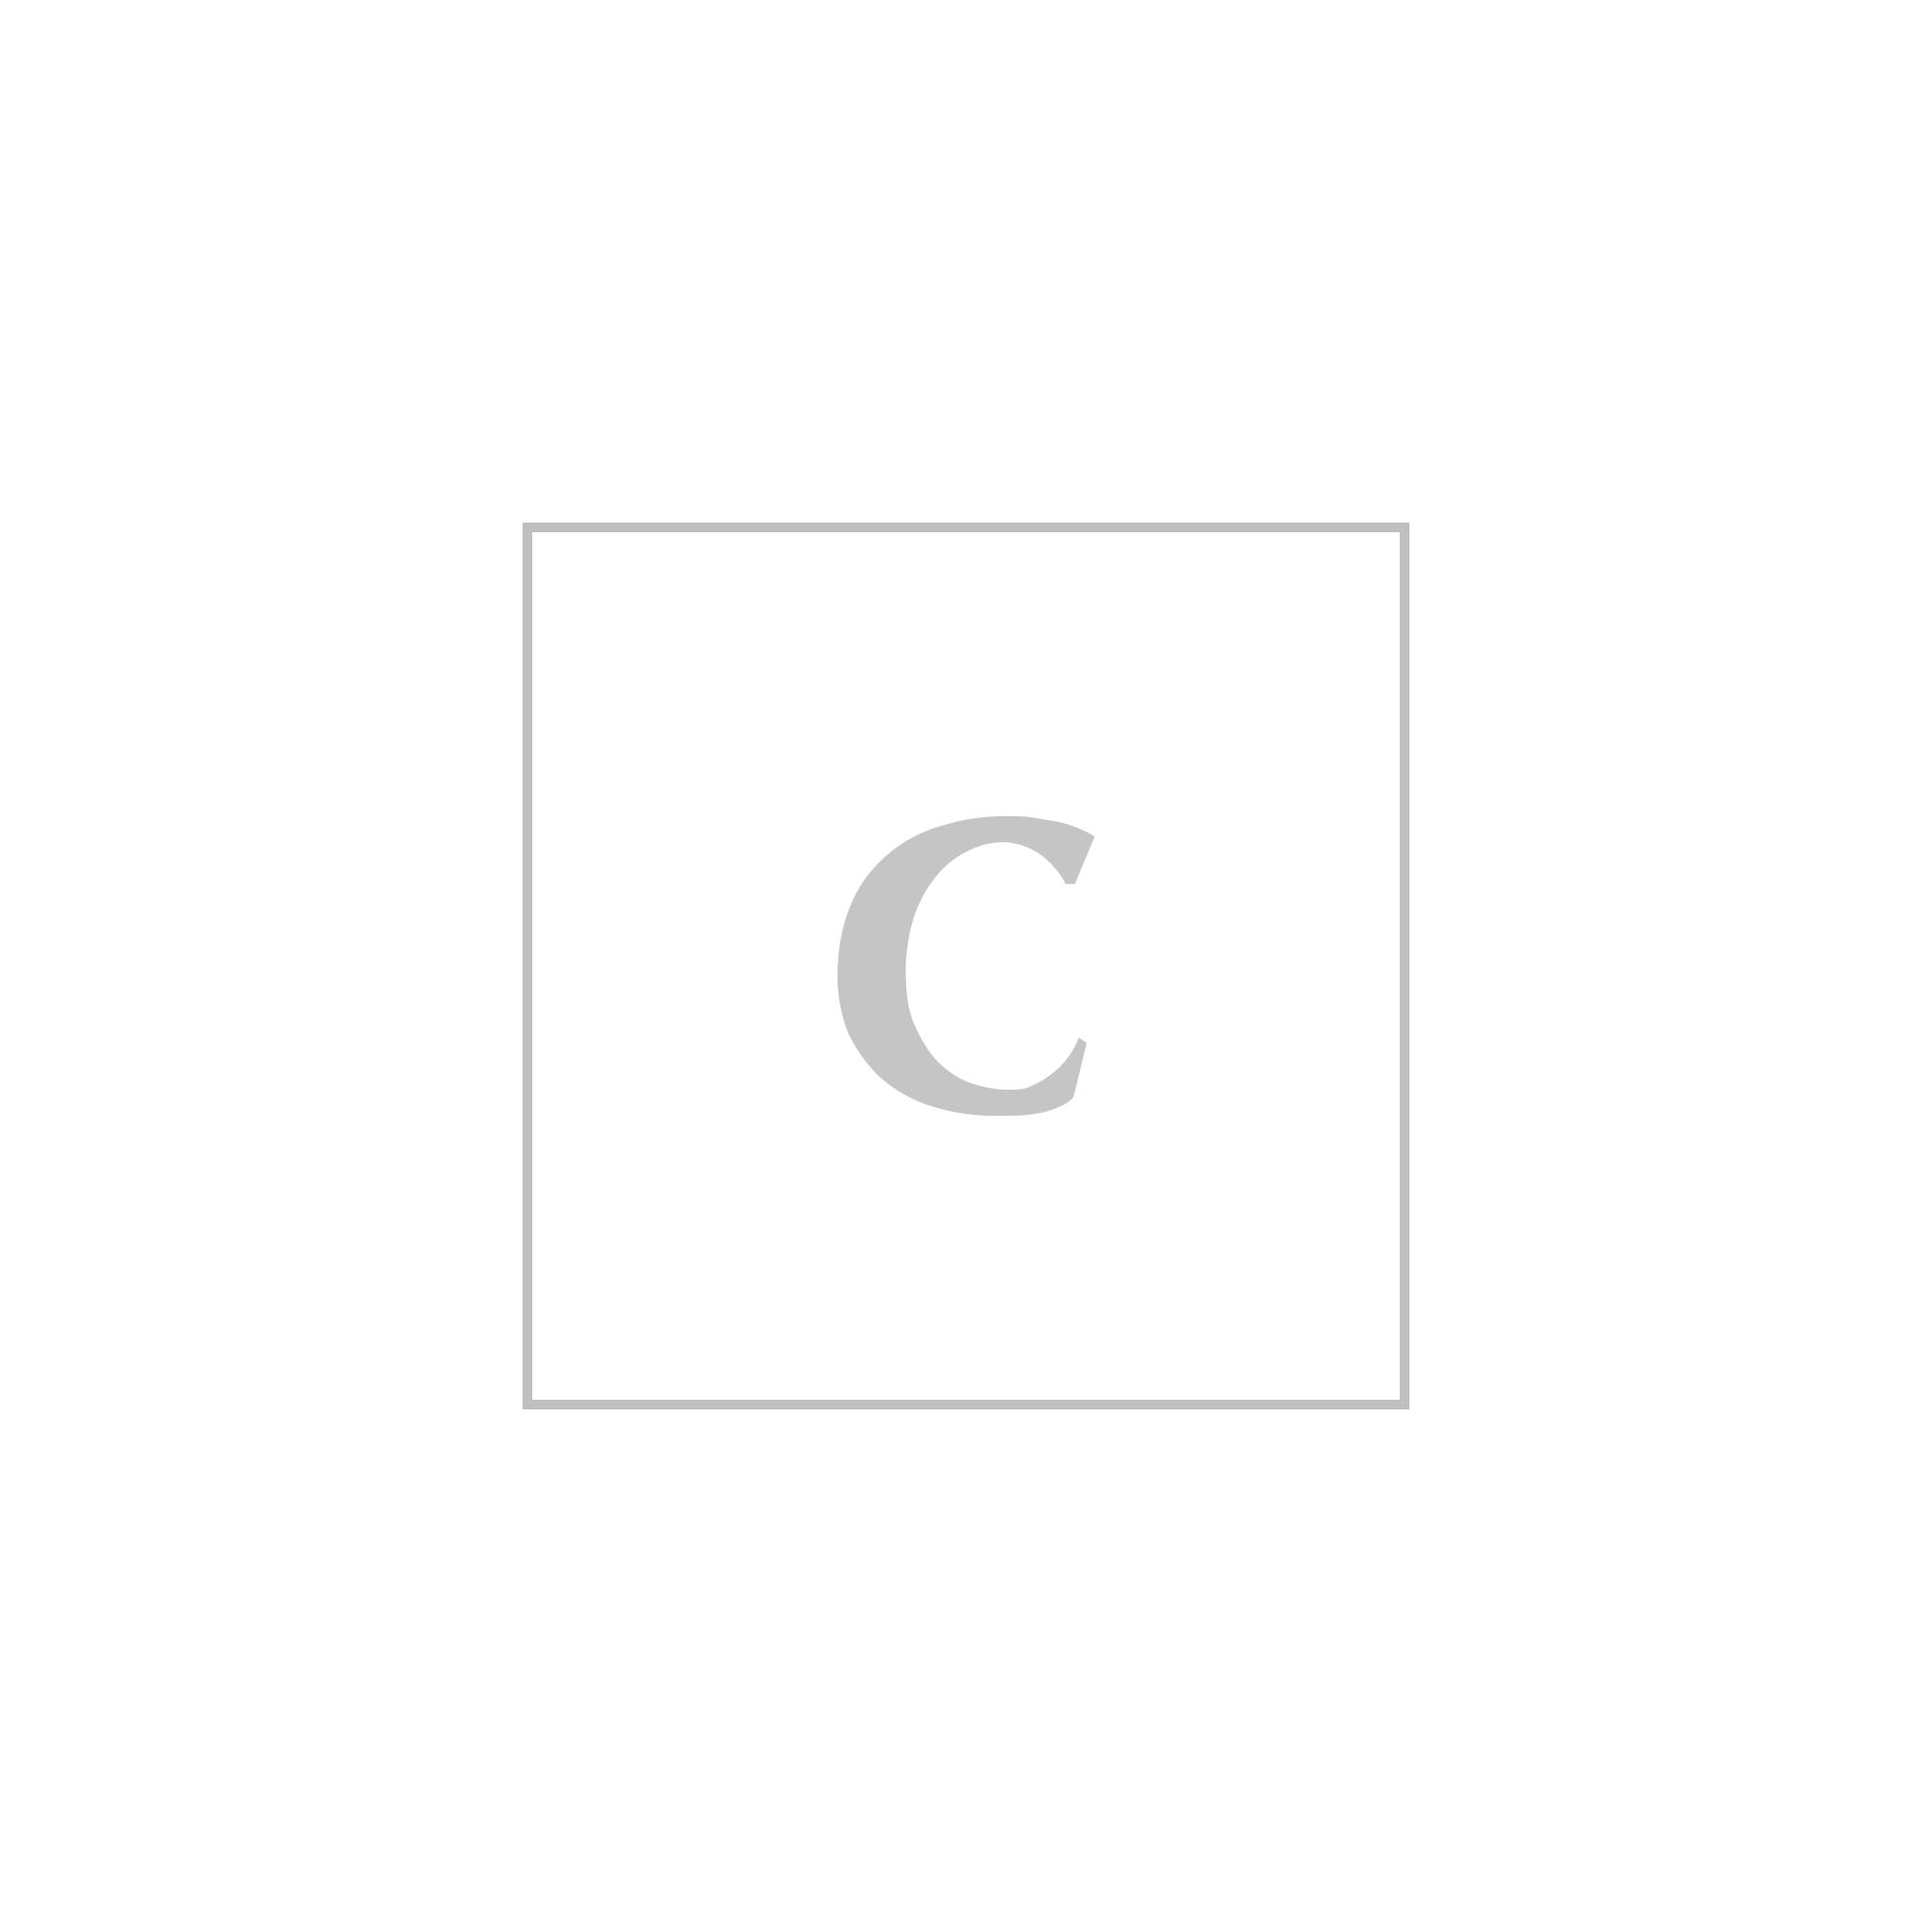 Carhartt logo jacket